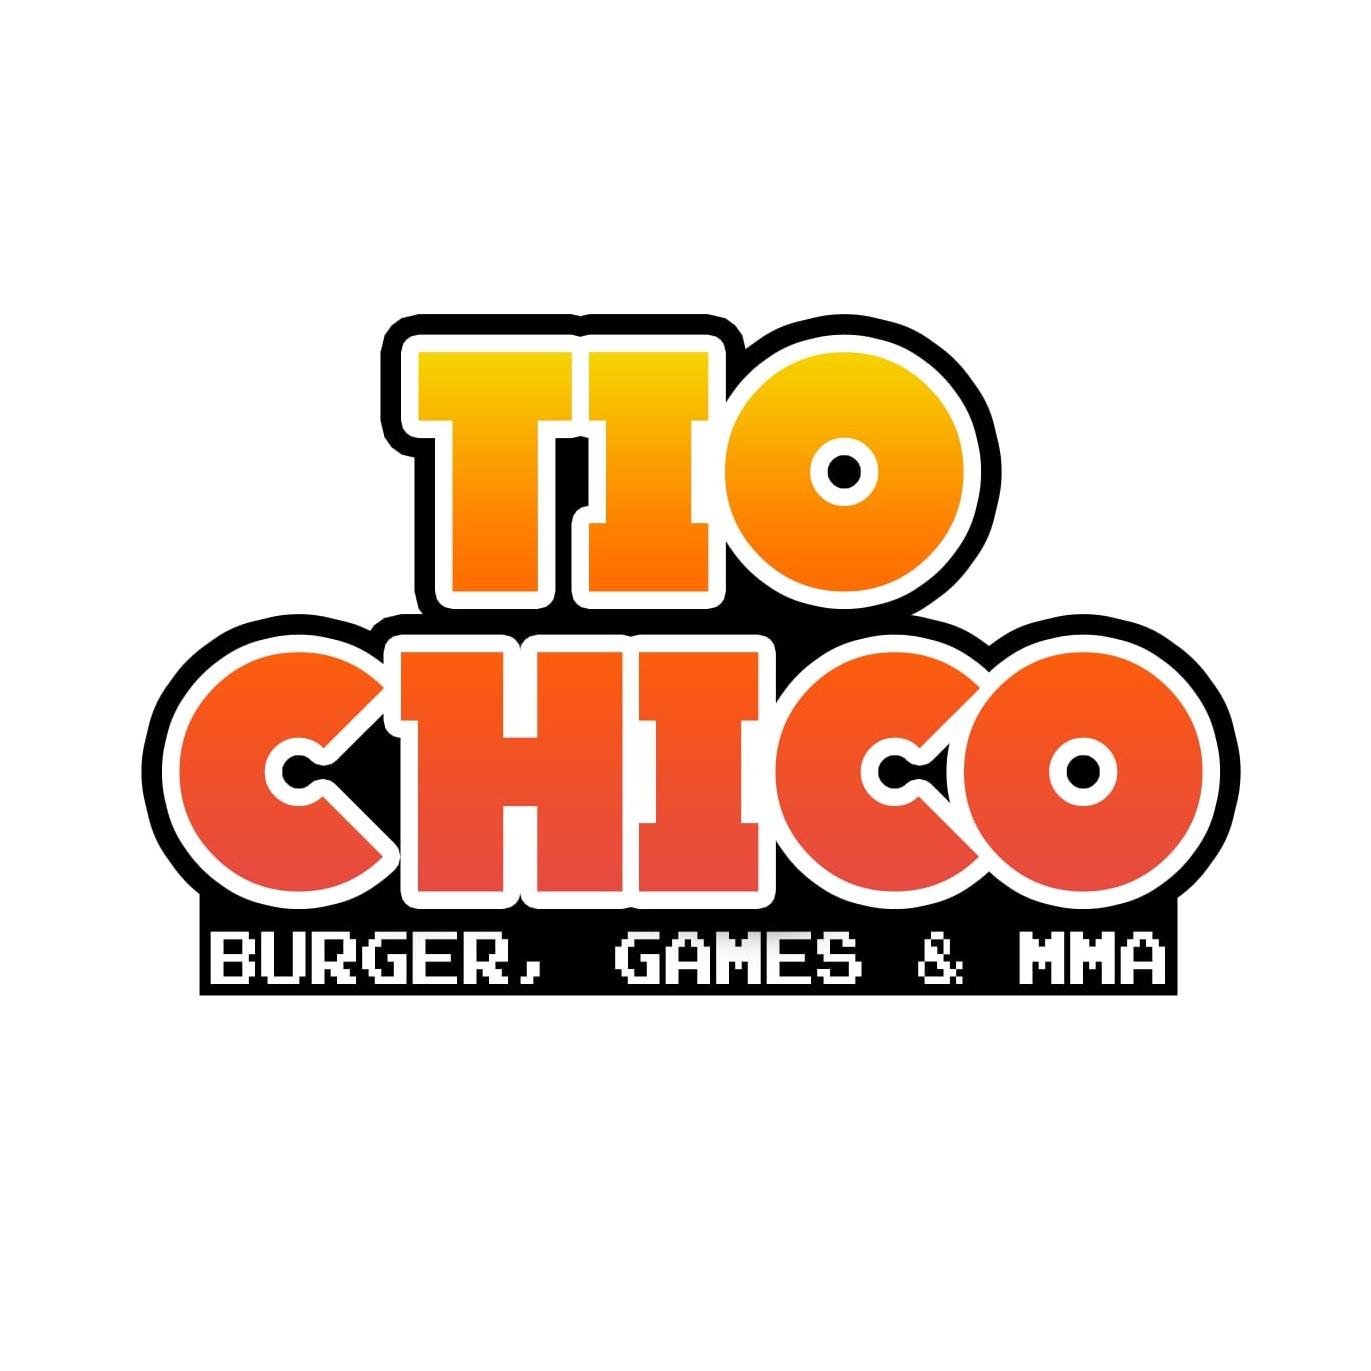 Tio Chico Burger